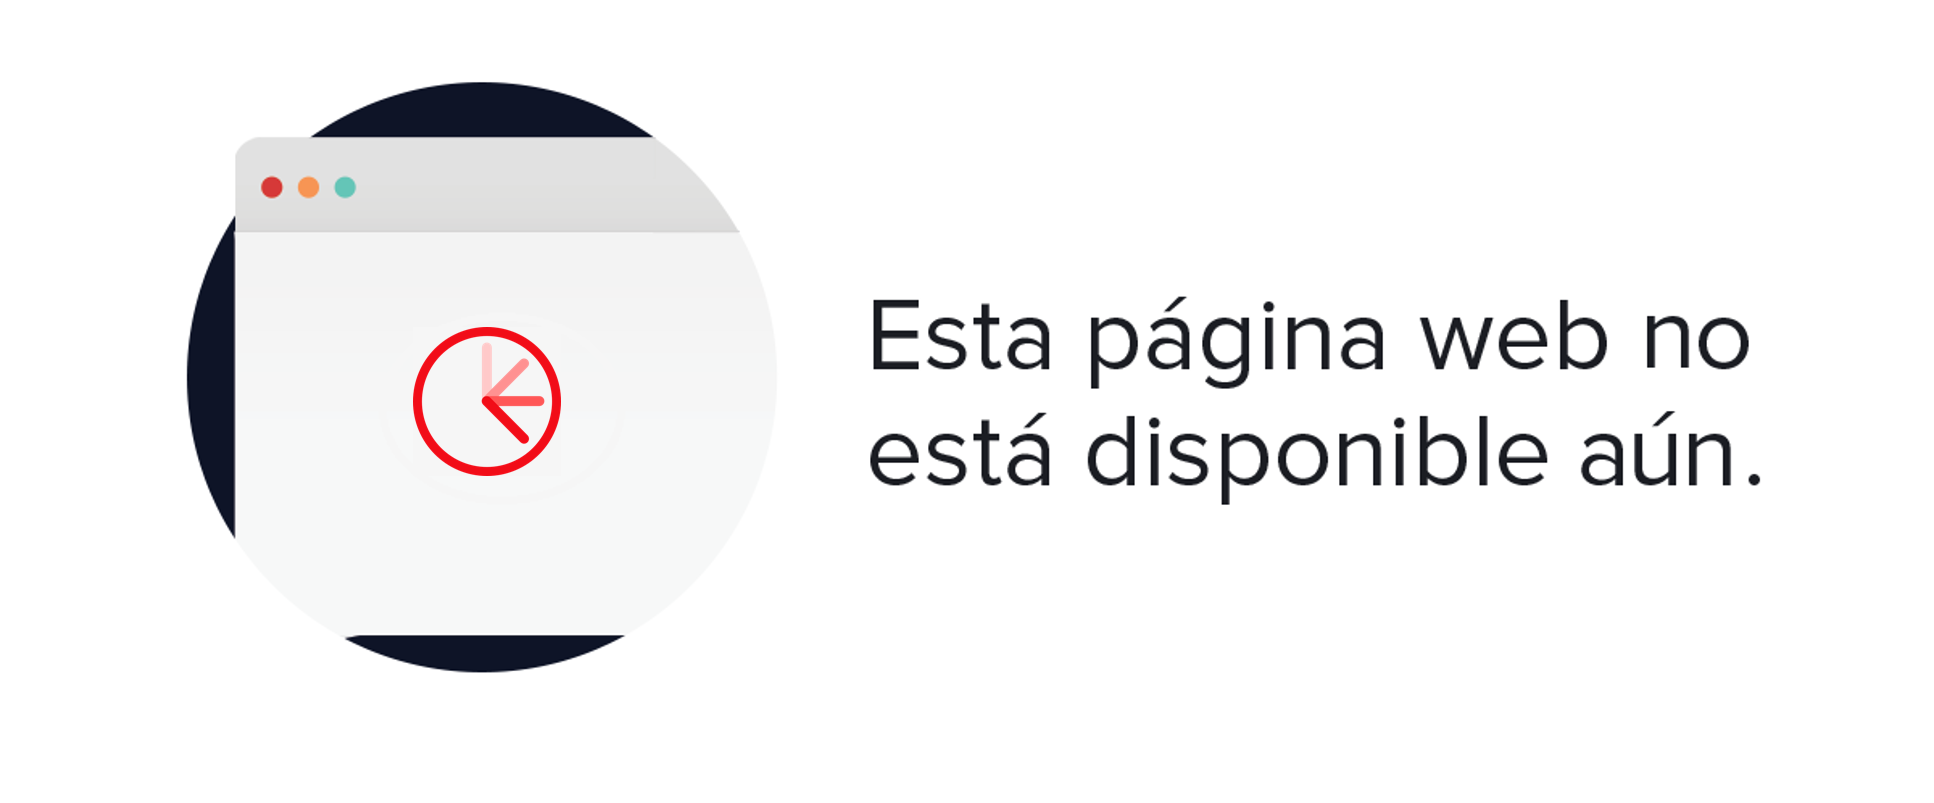 Bolsas de Papel Personalizadas con Asa Rizada Medidas 24+11x32 cm 100gr